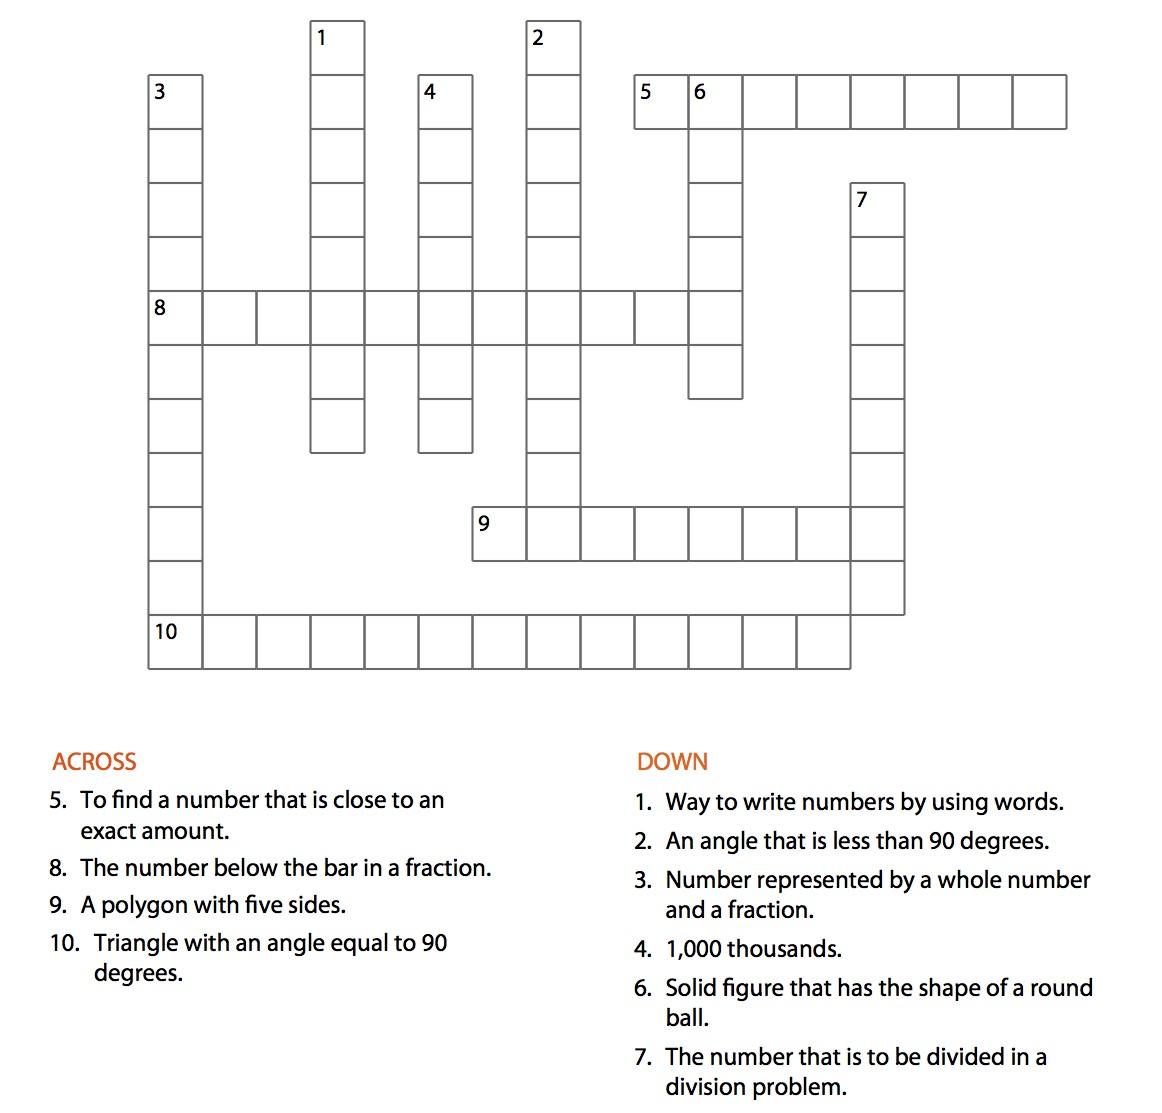 math-vocabulary-crossword copy